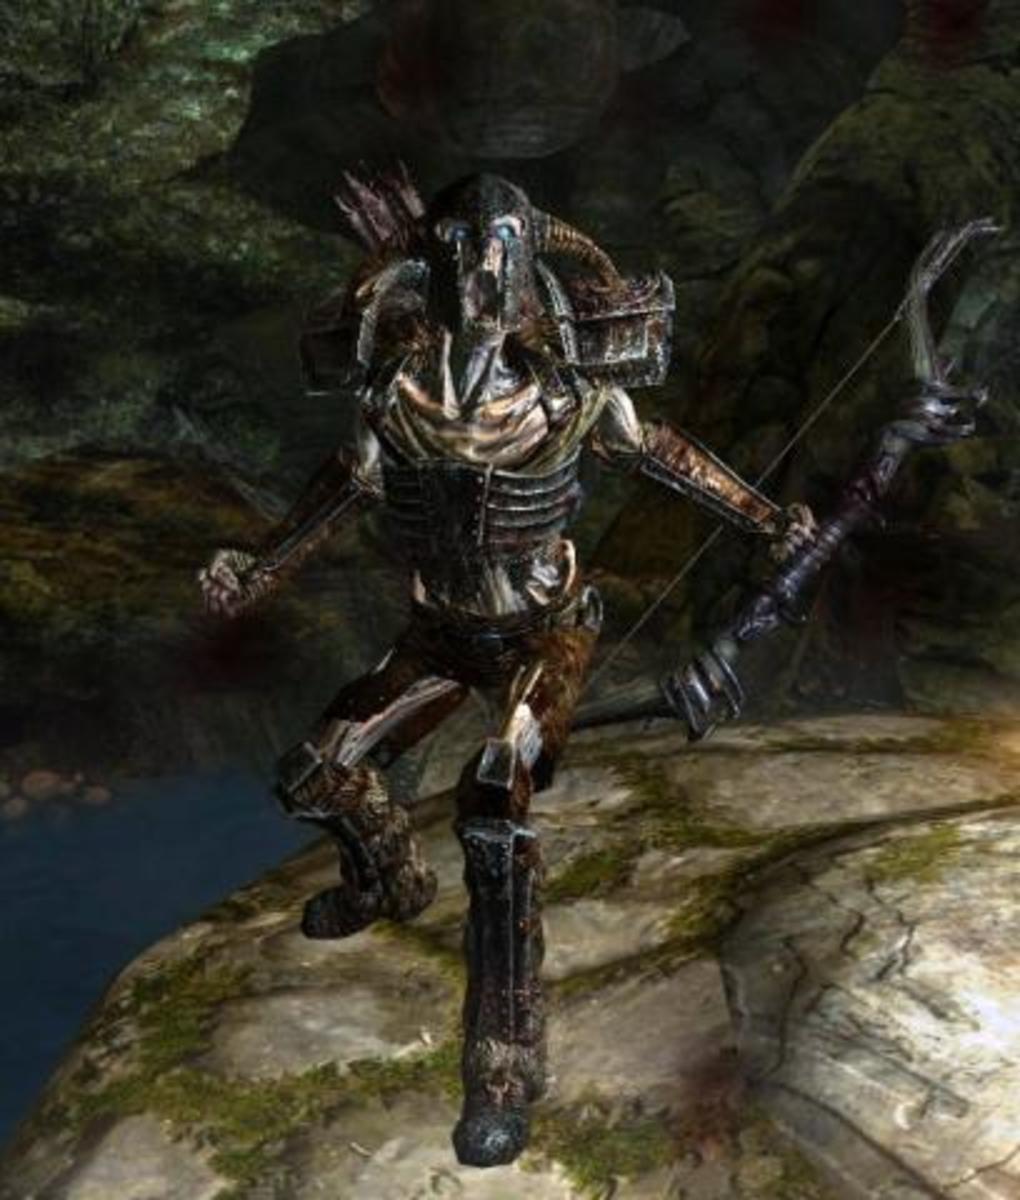 Skyrim: How to Defeat Draugr Deathlord Sigdis Gauldurson